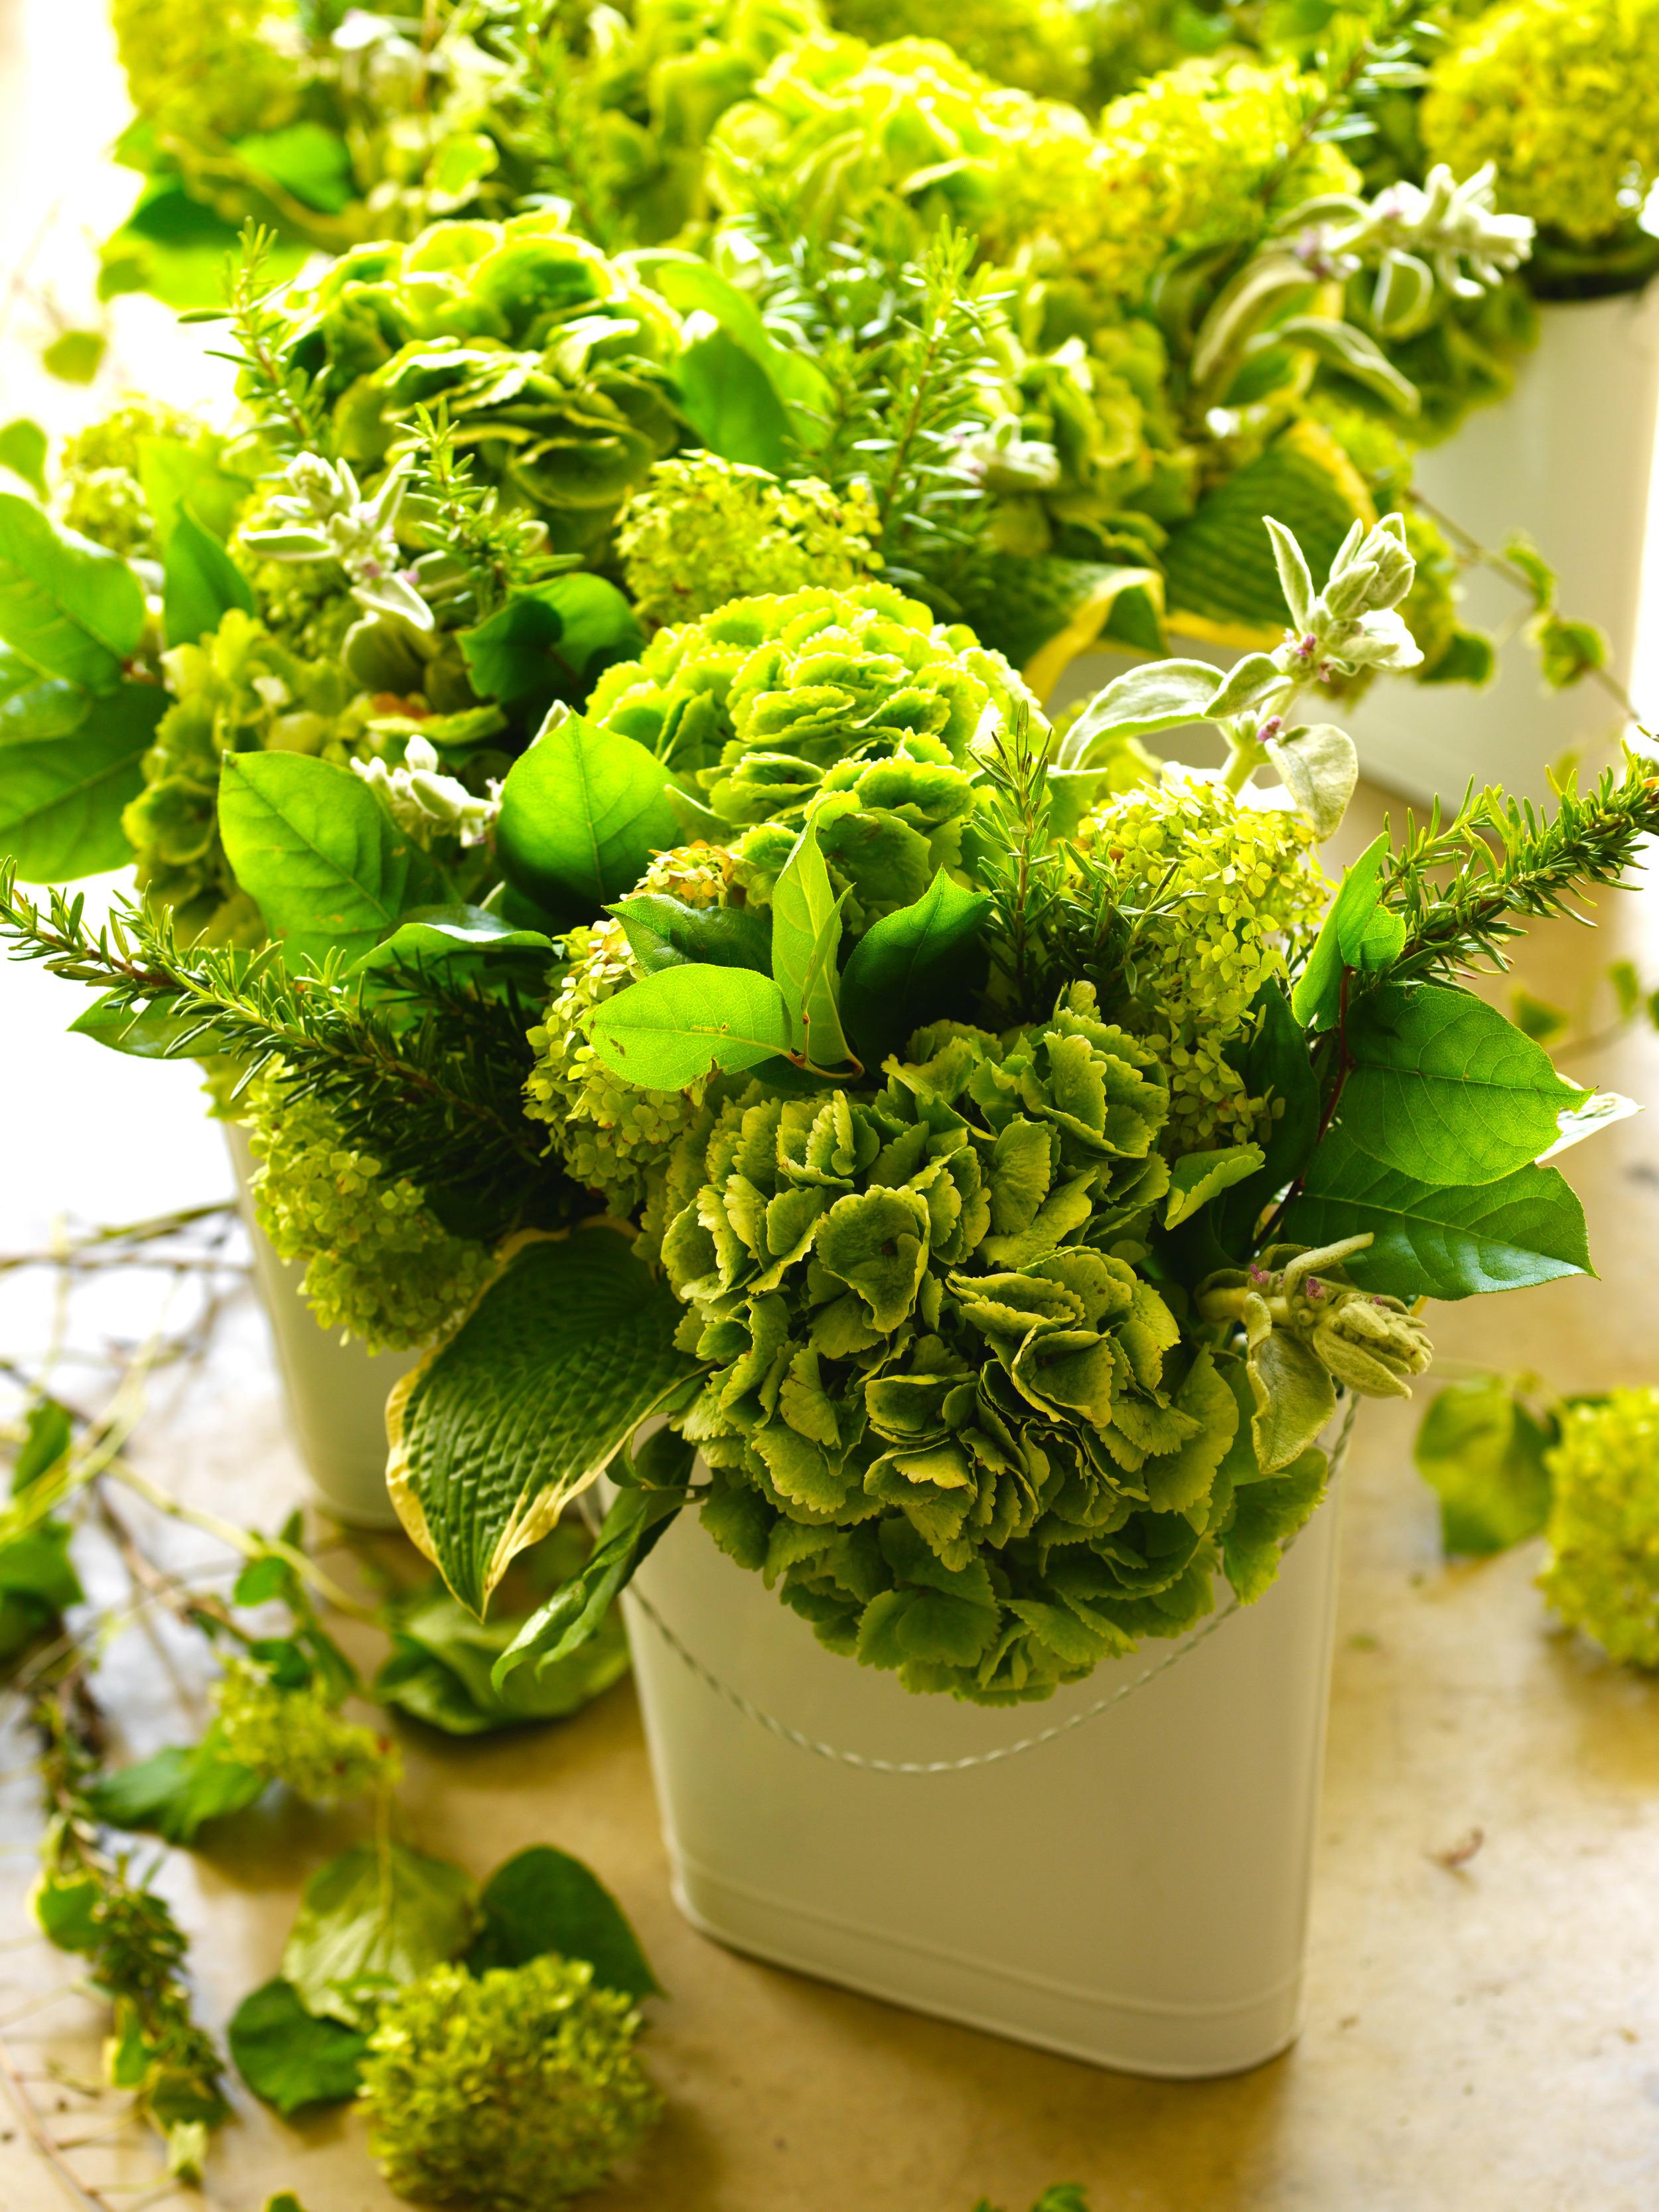 GardenShop_0016_2_2.jpg